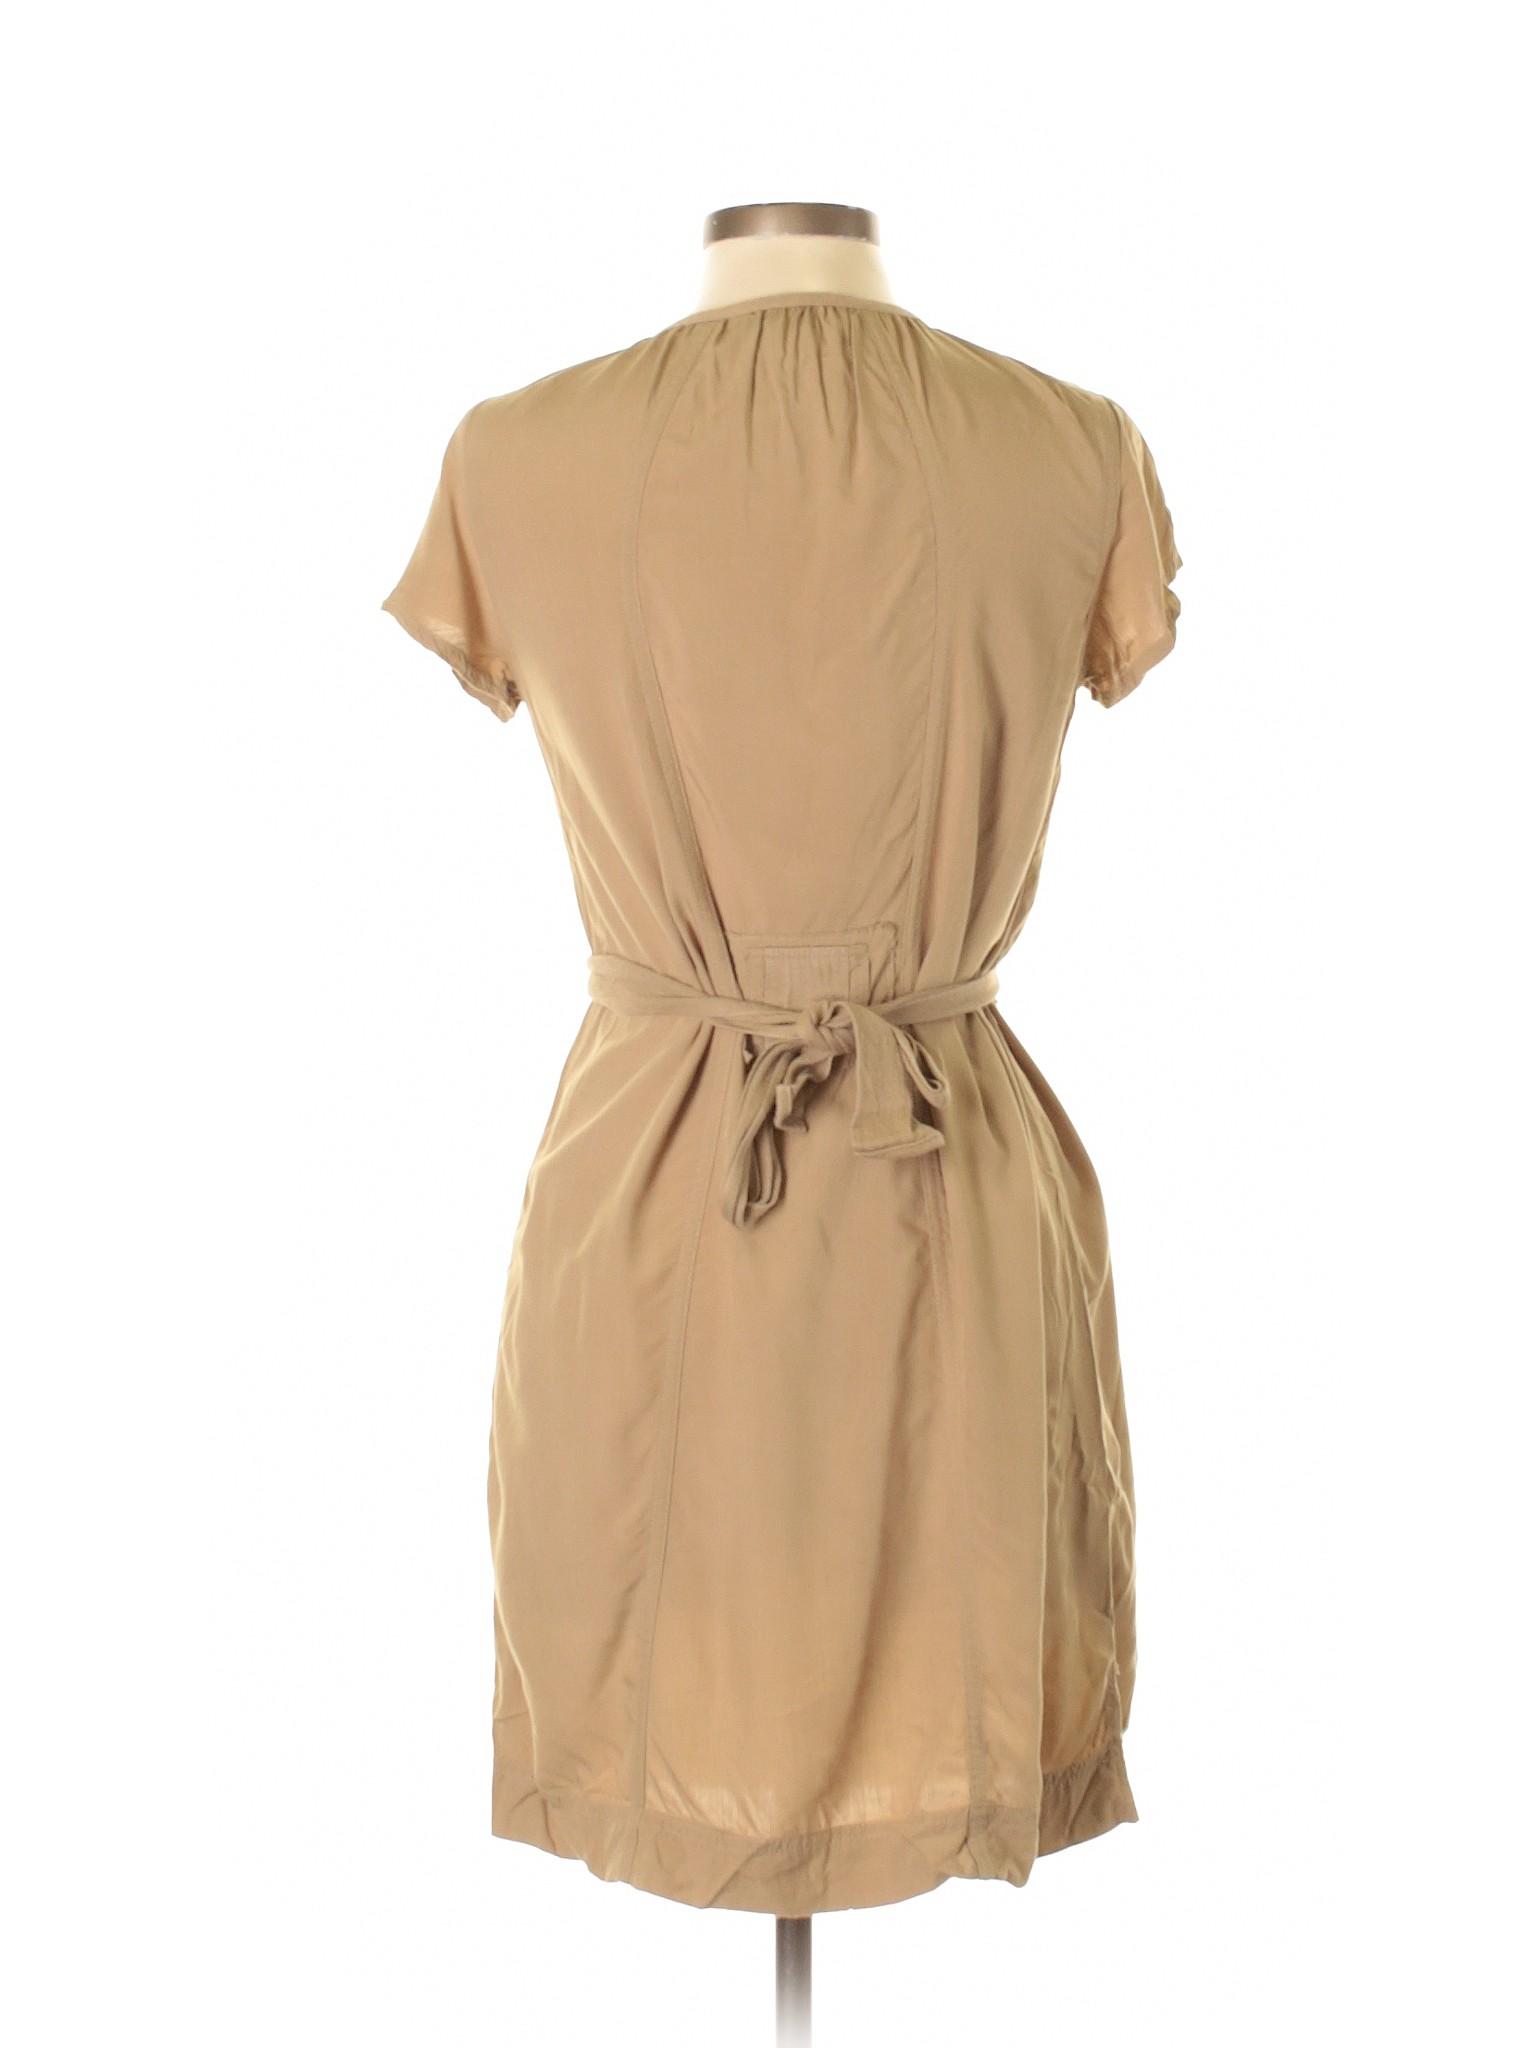 Selling Dress Gap Selling Gap Casual Casual dx44TZ8qXw